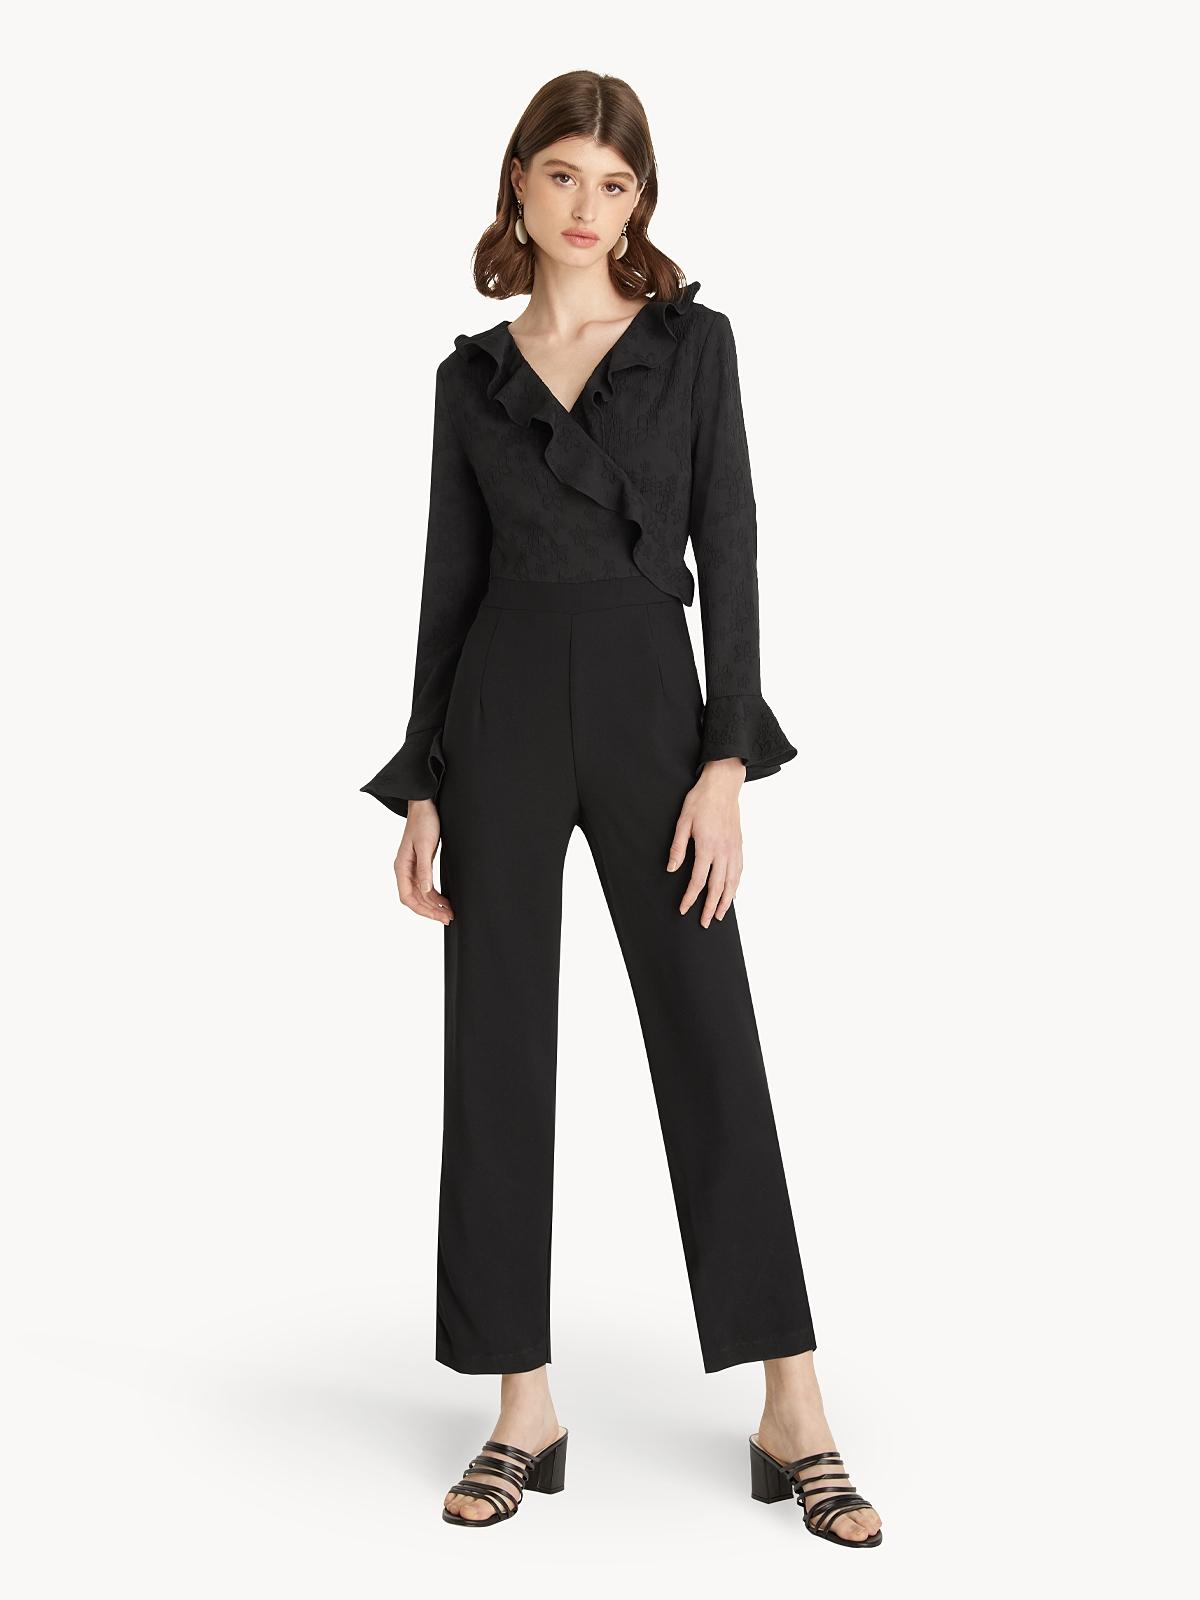 Ruffled Collar Jumpsuit Black